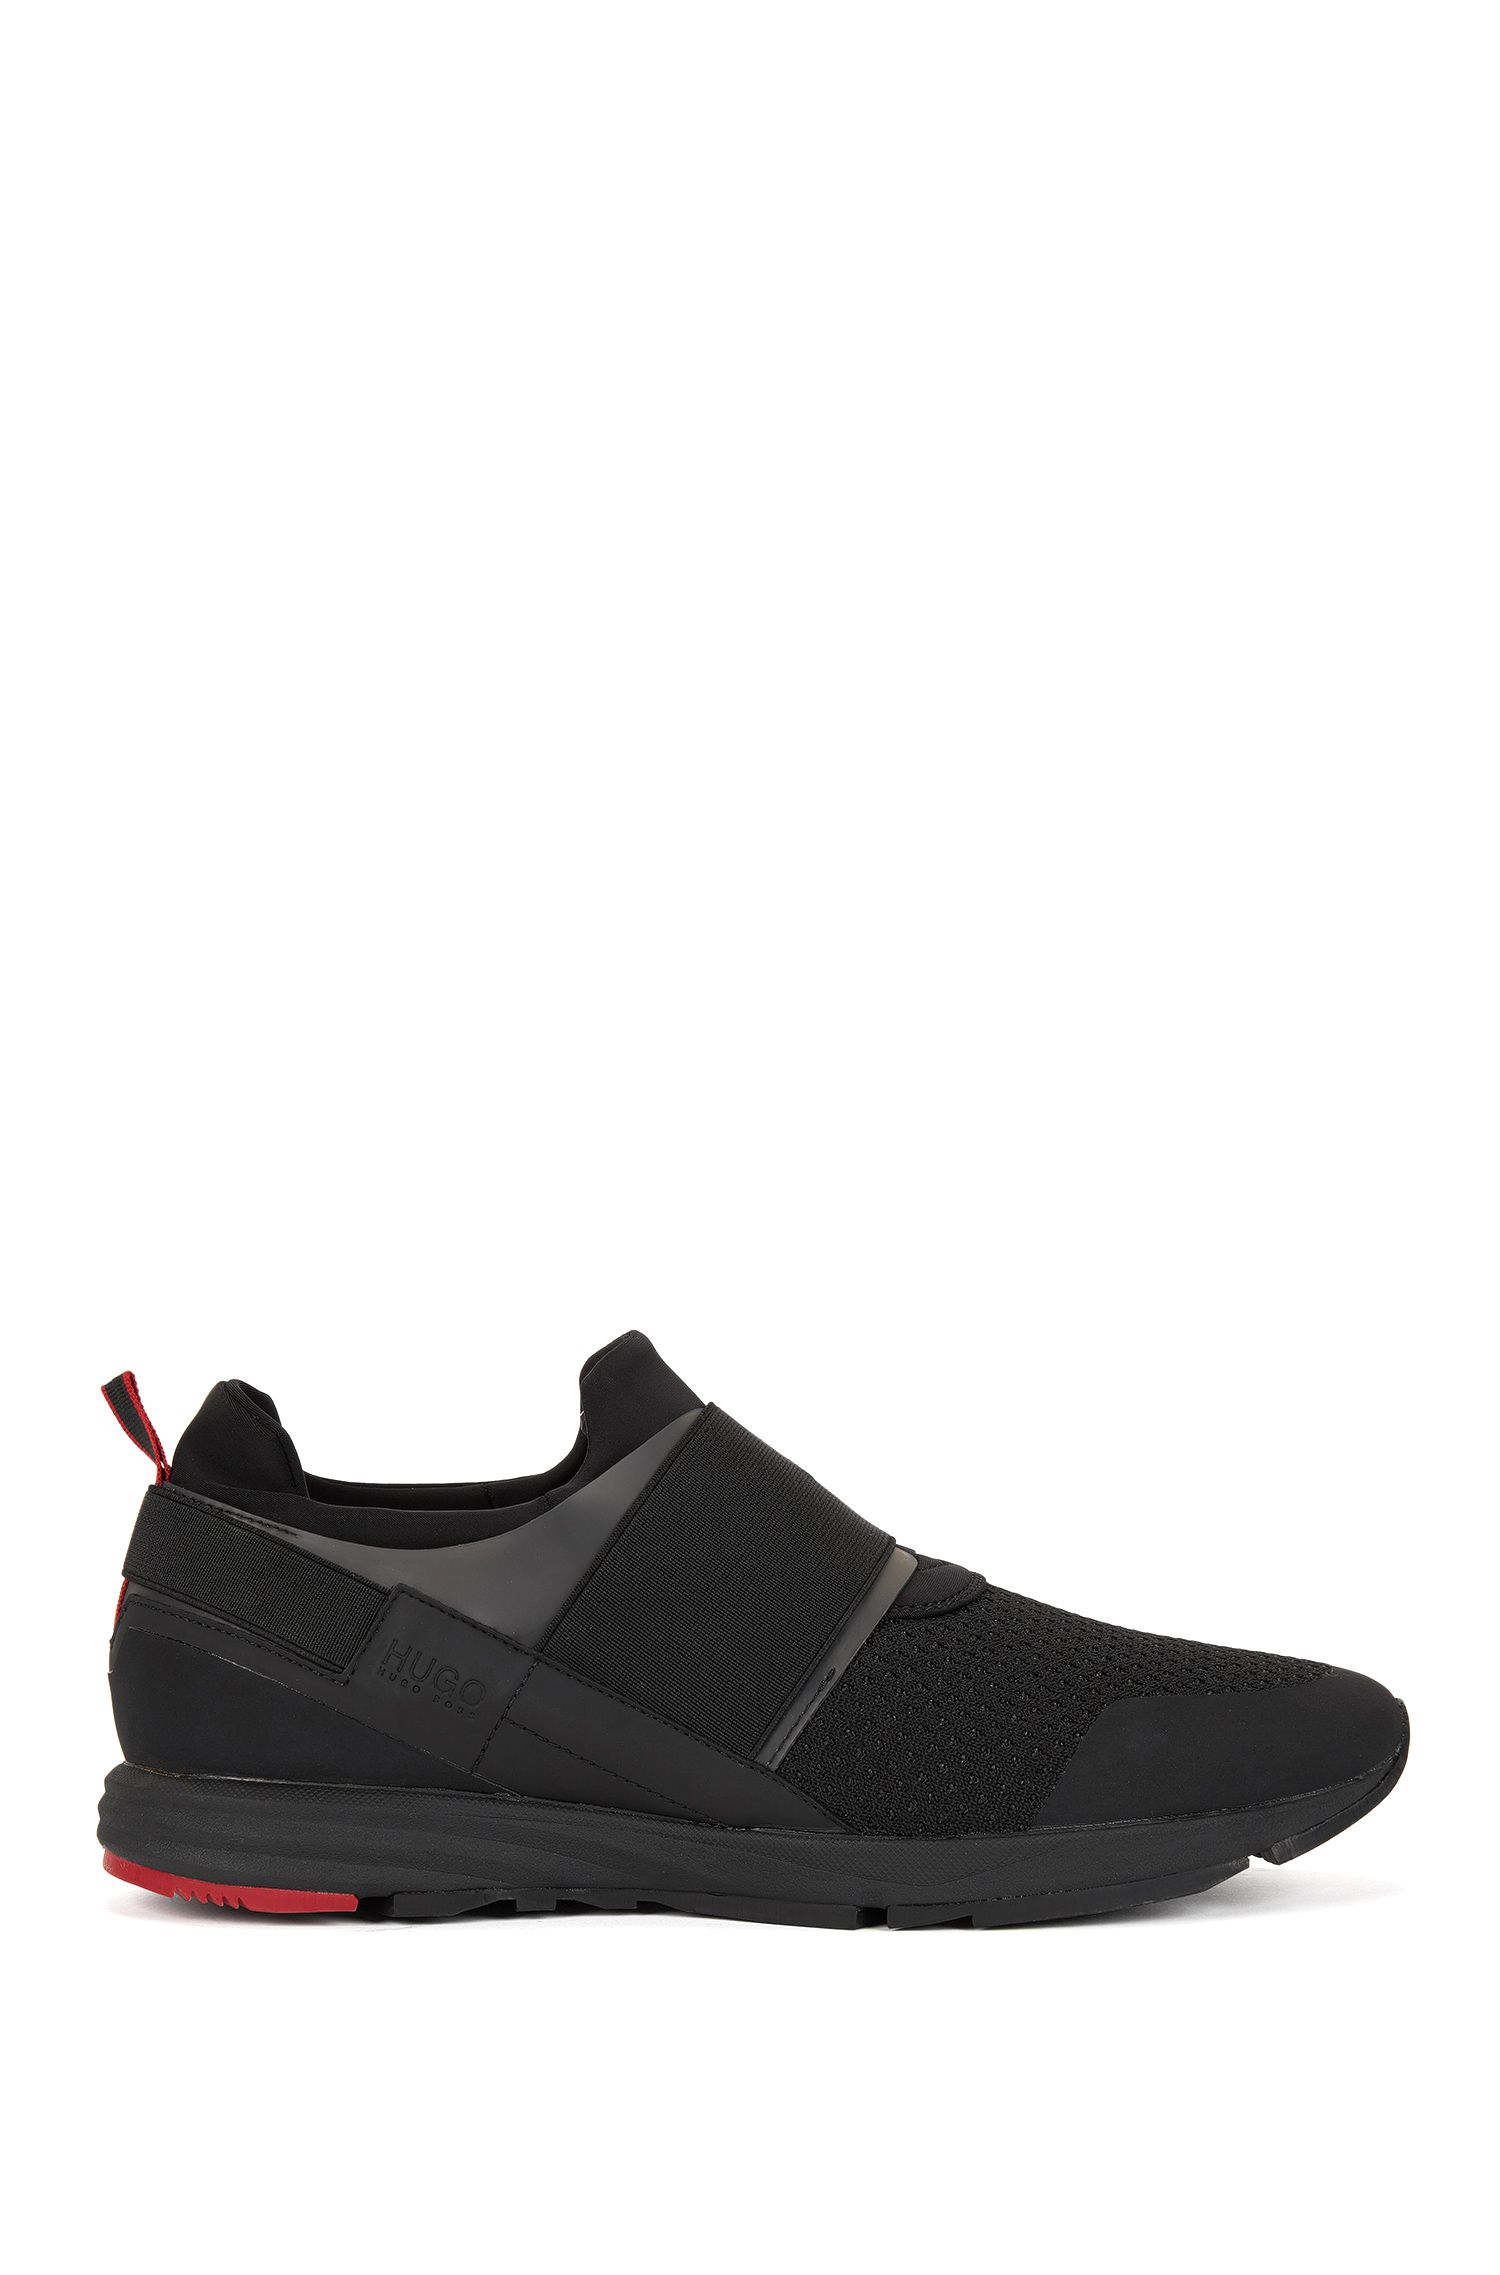 Sneakers aus Material-Mix mit elastischem Riemen